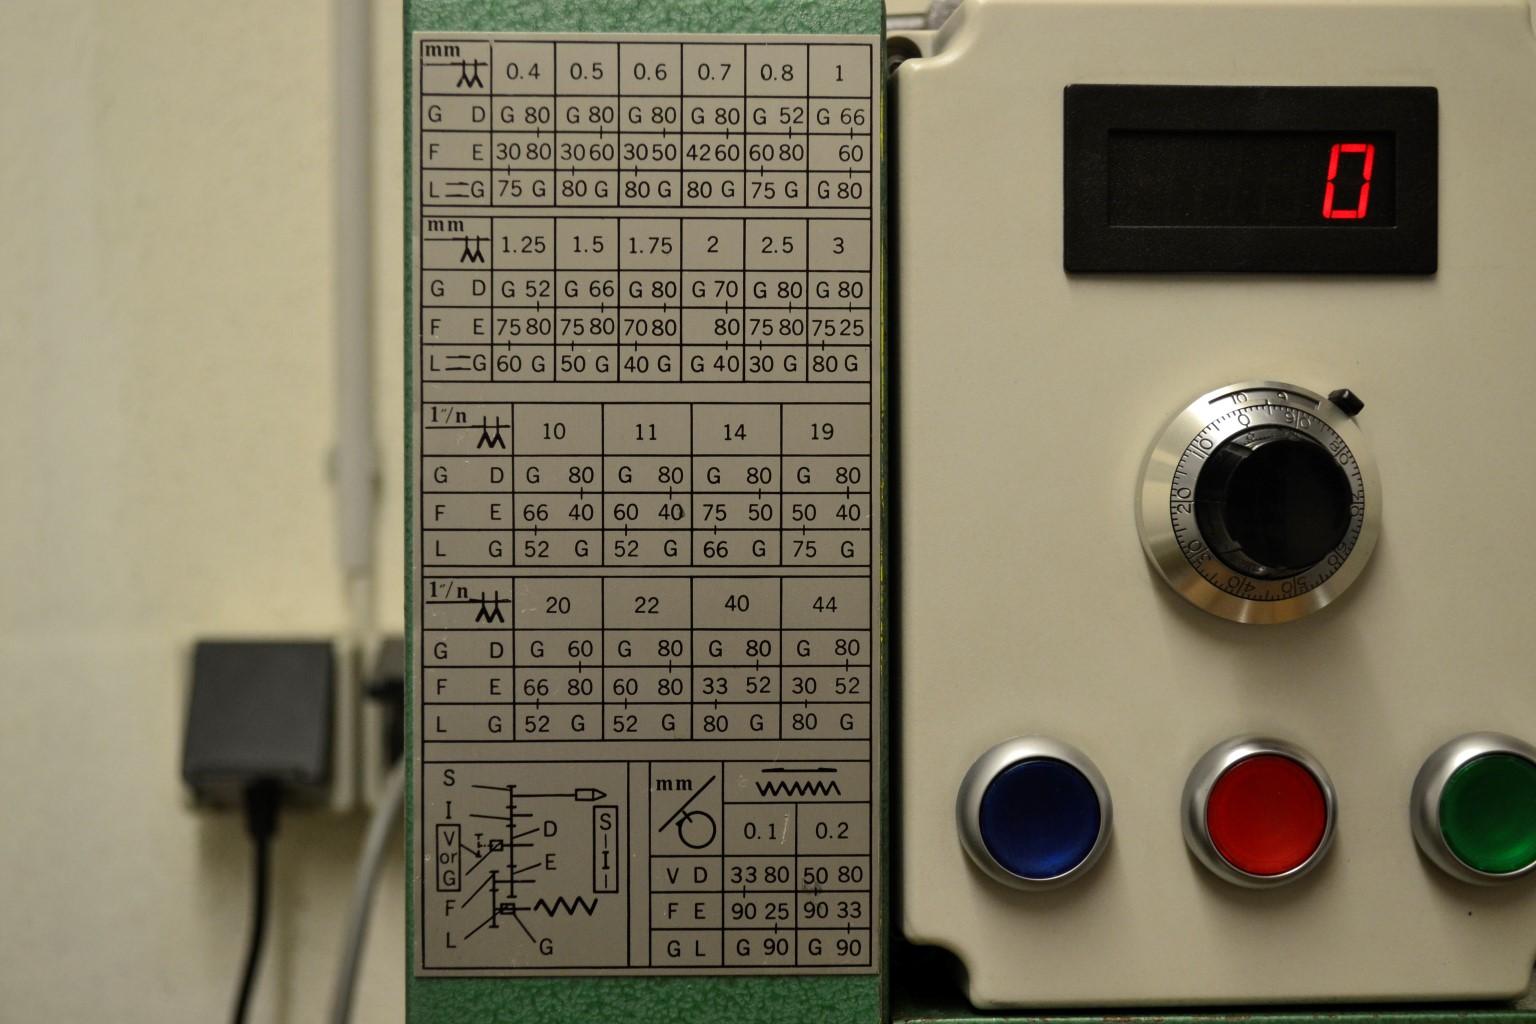 Interkrenn IKD-555